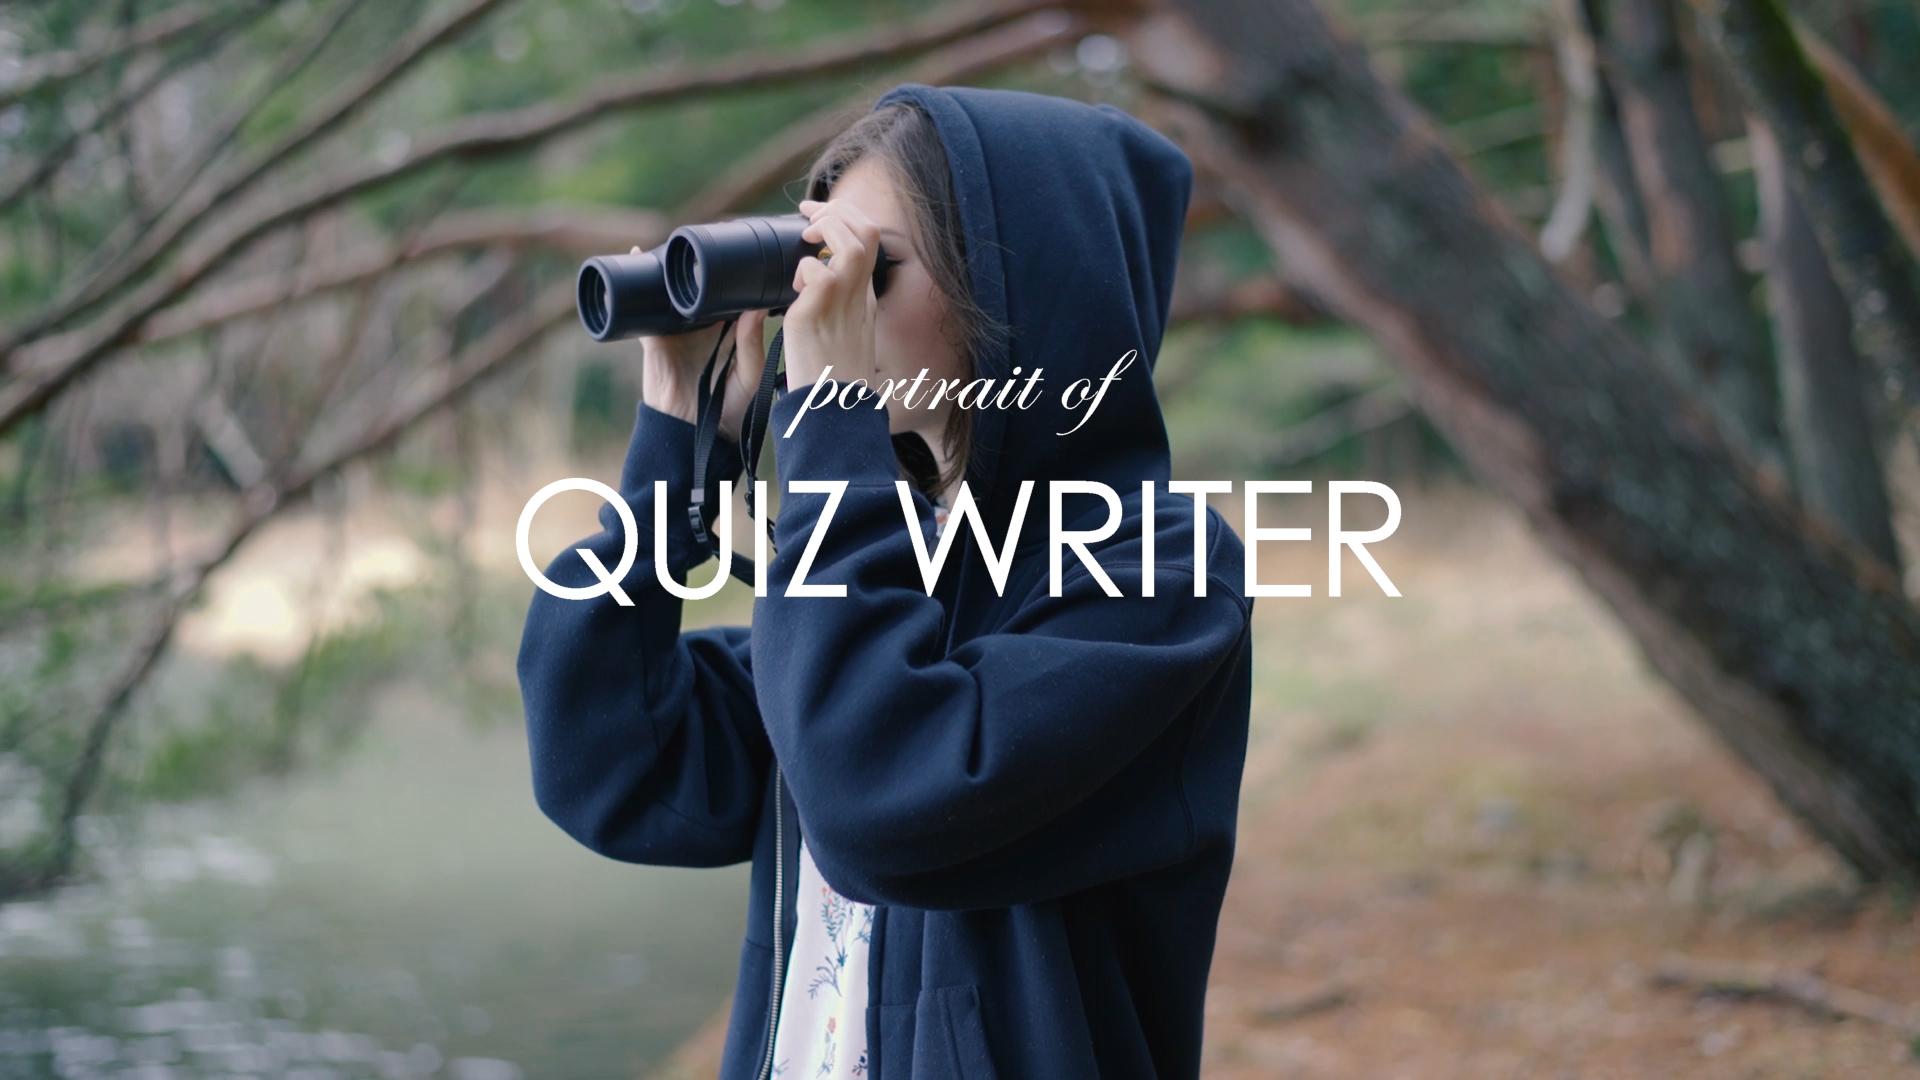 QUIZ WRITER FOR TRIALGALLERY | INDEPENDENTFILM